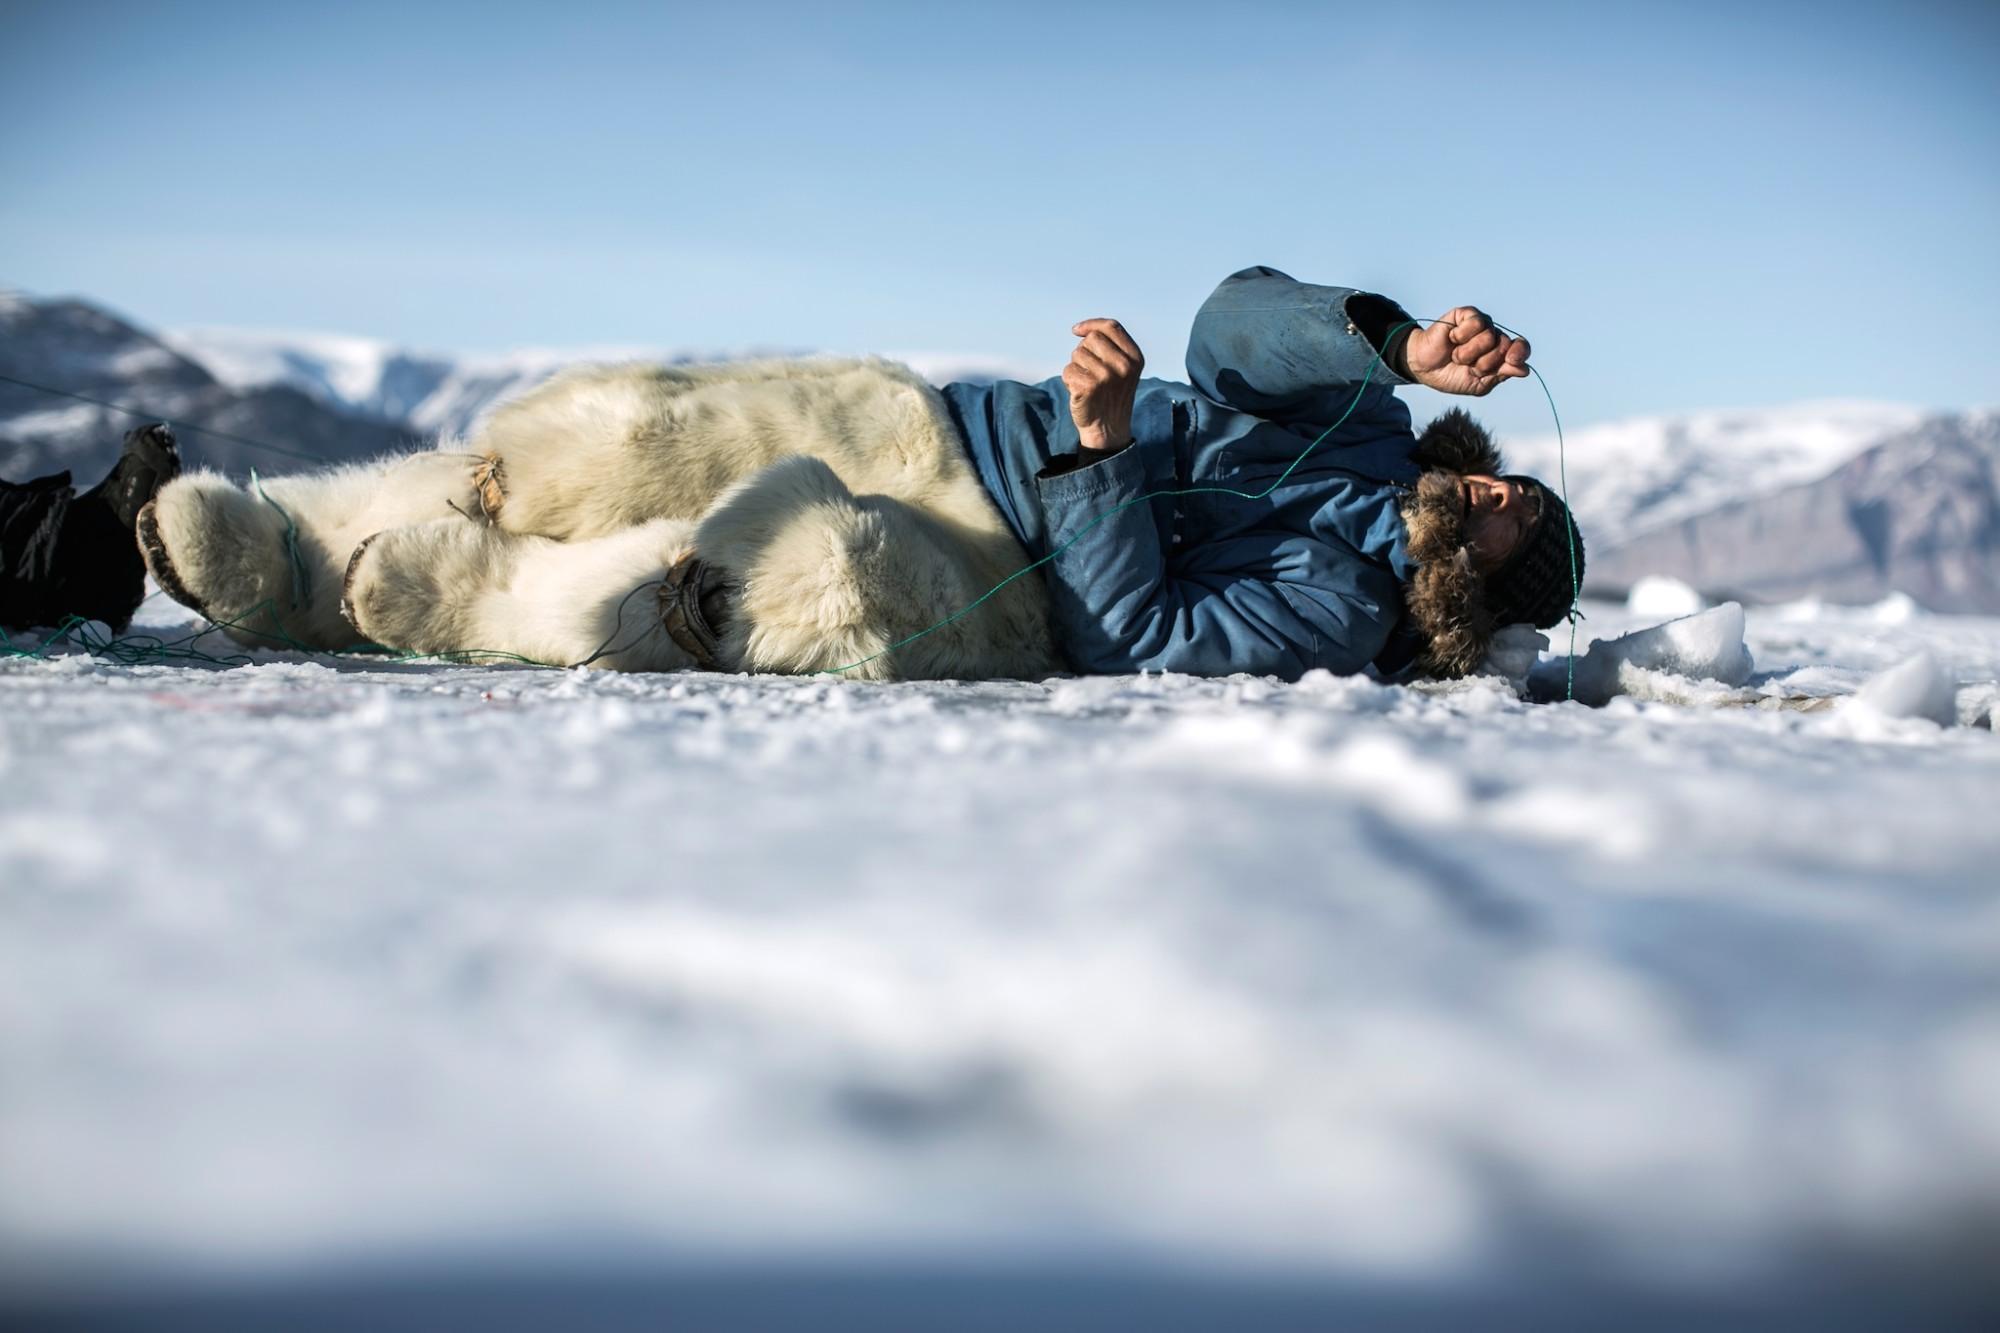 Cirili Jazbec 027-On-thin-ice-NEW